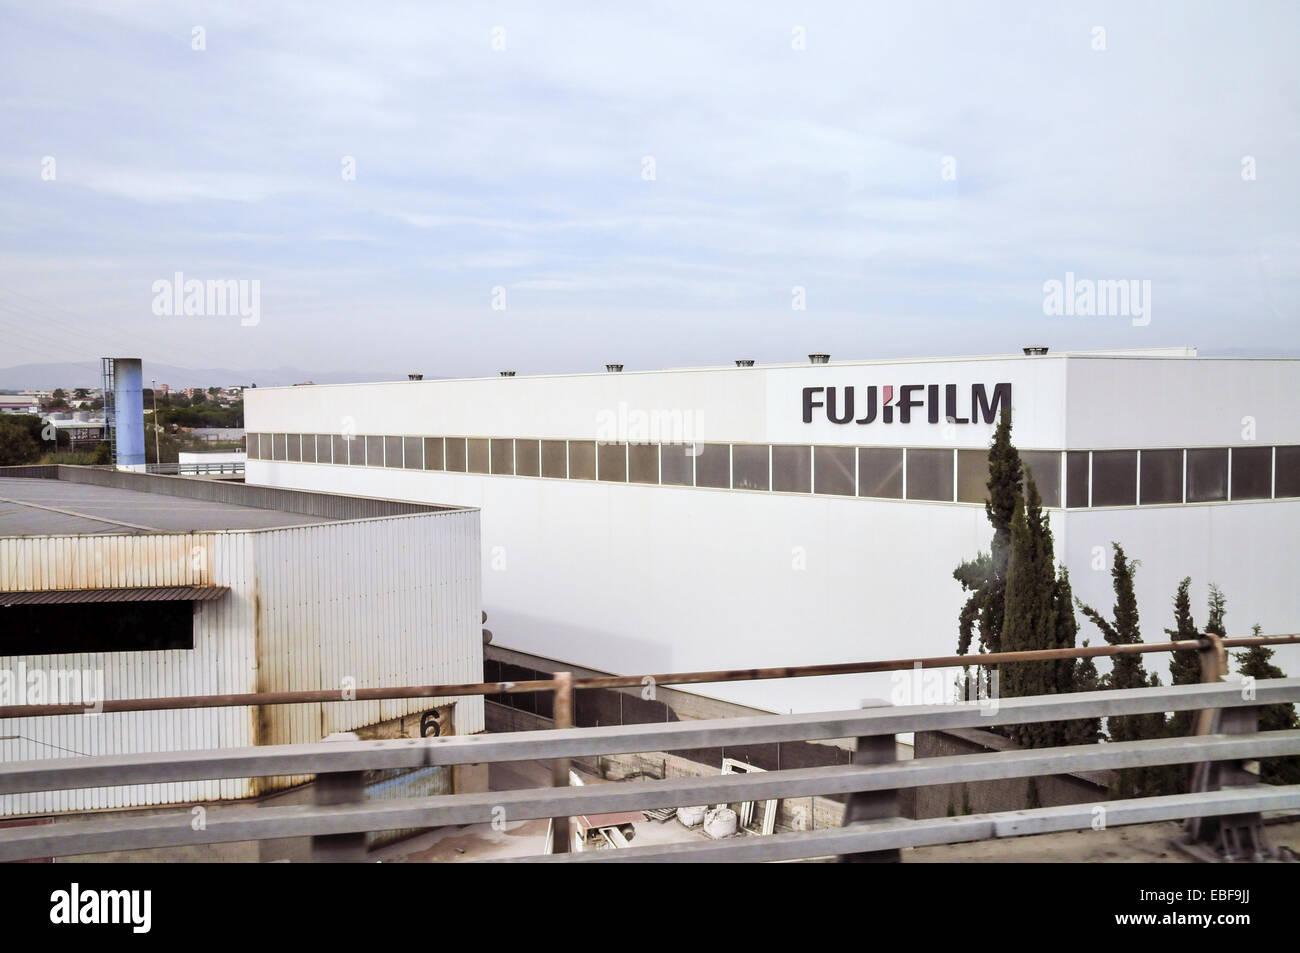 Fujifilm factory in Catalonia, Spain - Stock Image